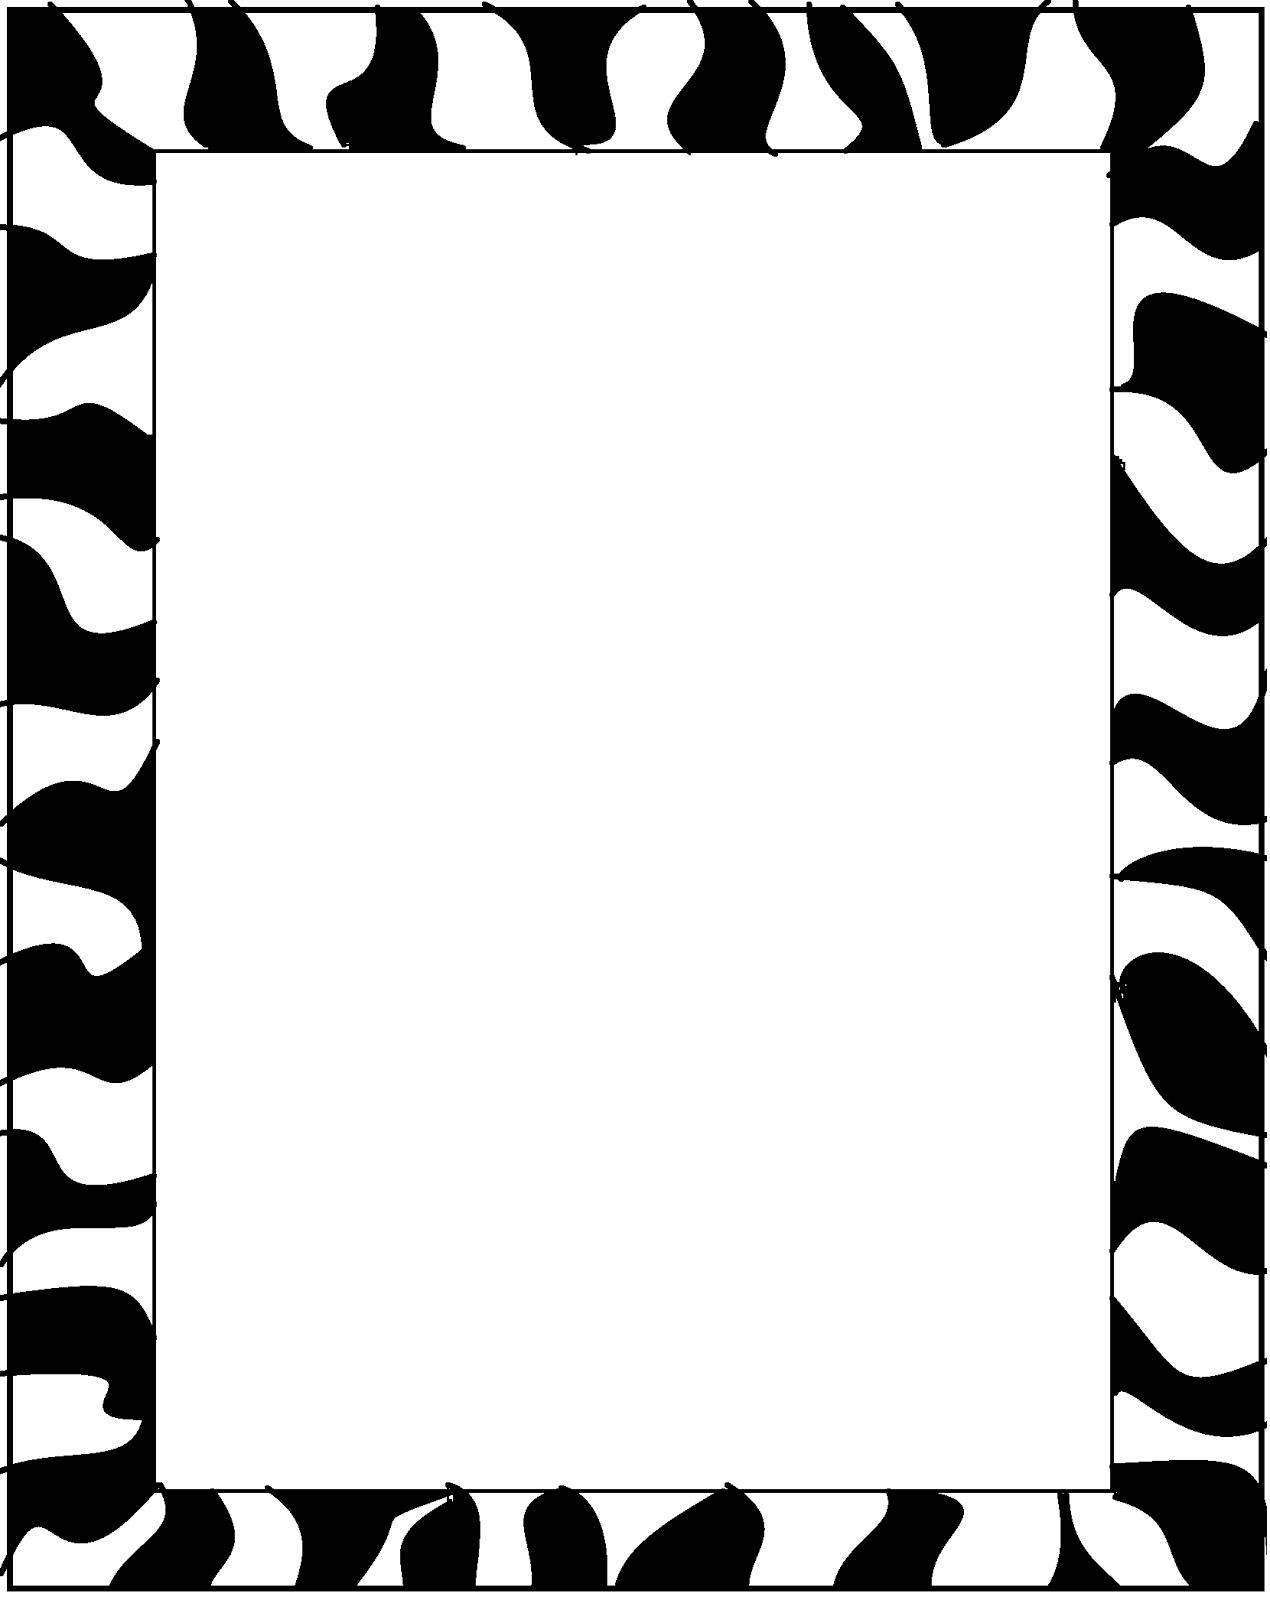 Zebra Border For Microsoft Word bigking keywords and pictures